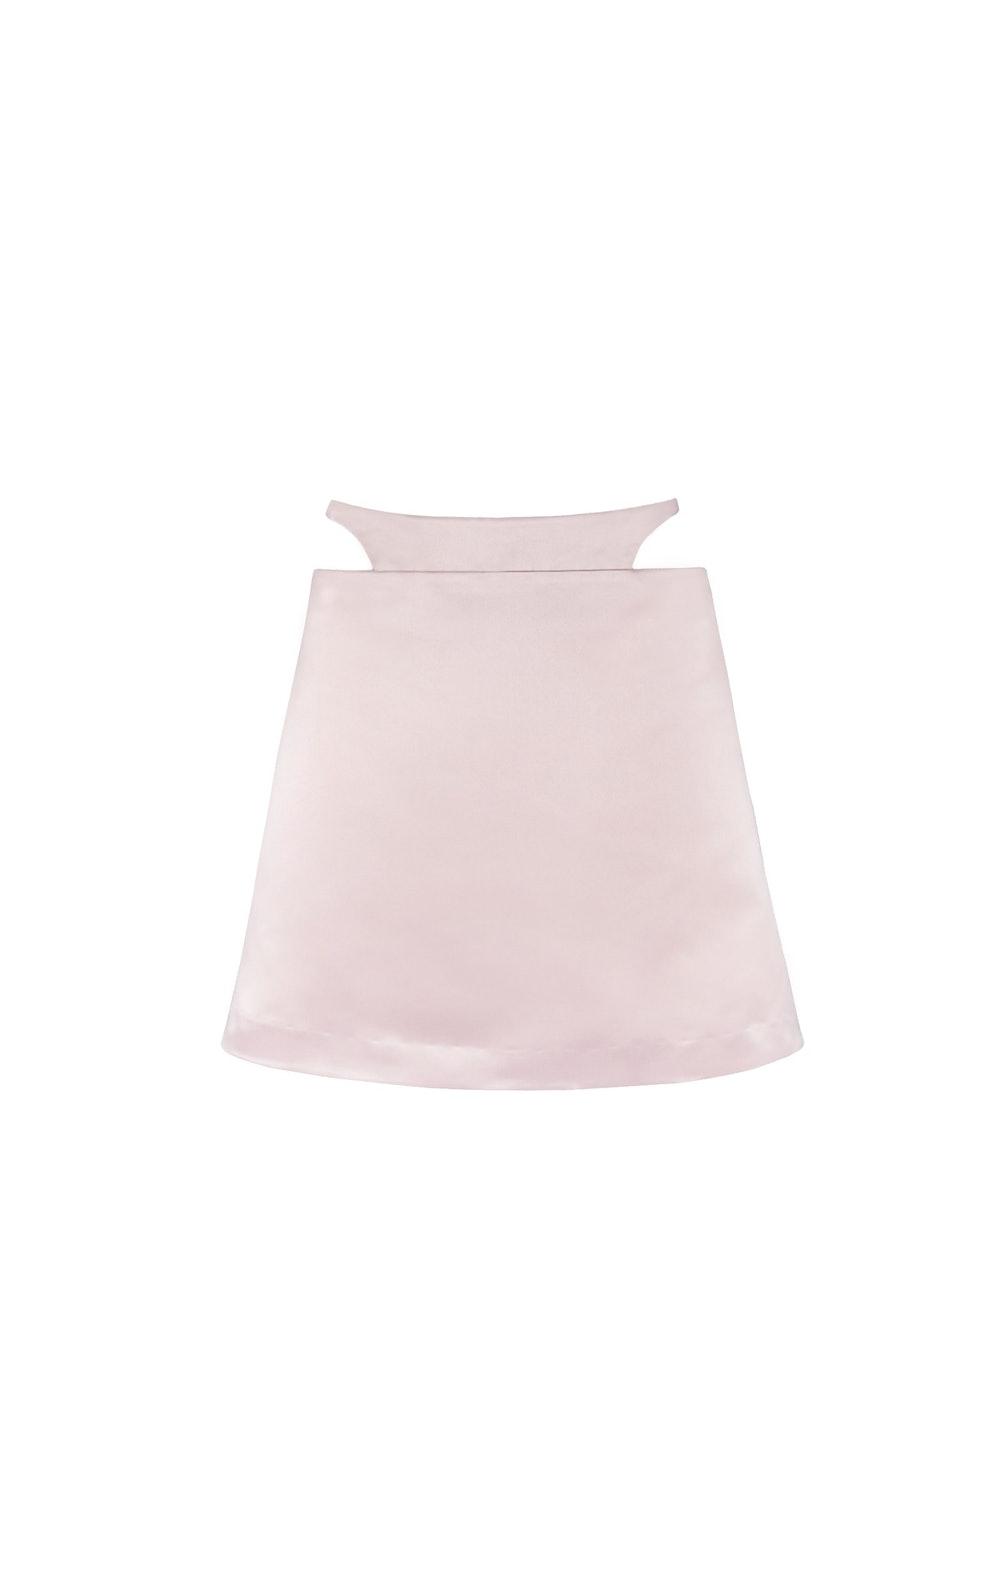 Bunny Skirt in Balm Satin